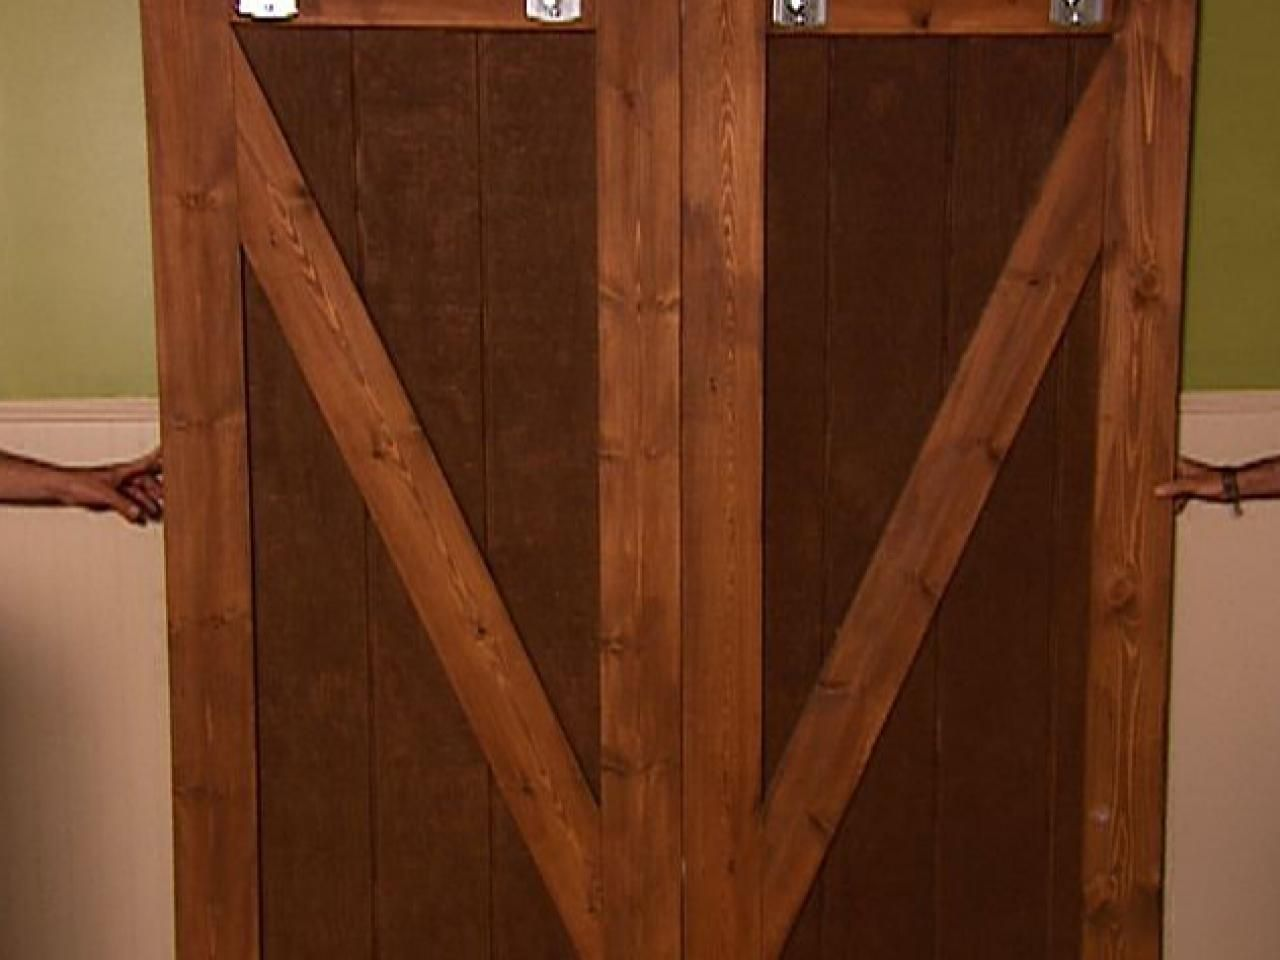 How To Make Barn Door Style Blackout Shutters Making Barn Doors